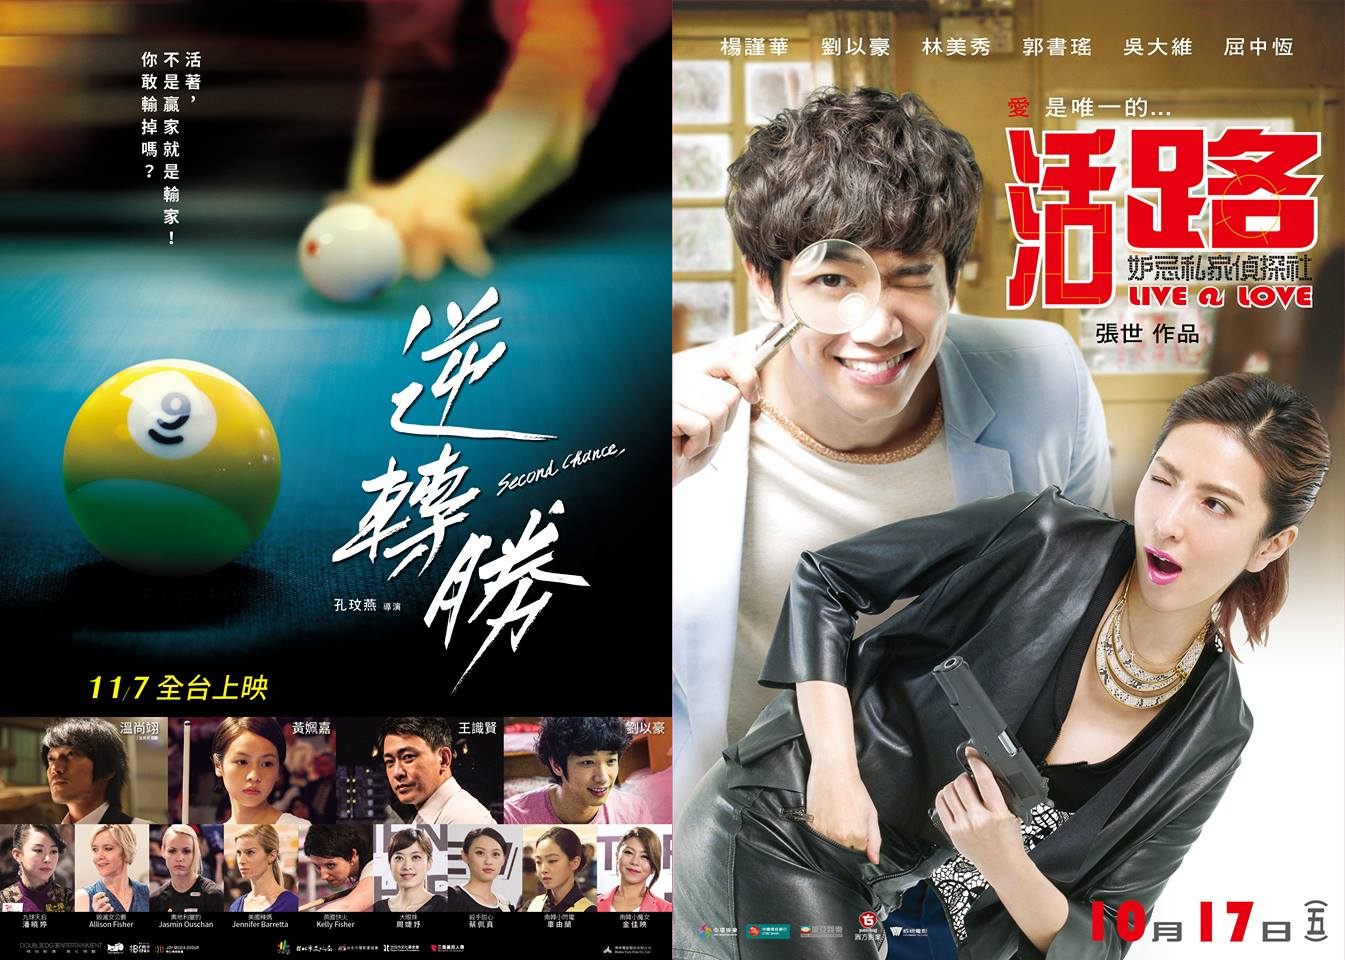 2 Upcoming Films of Jasper Liu with Cheryl Yang and Huang